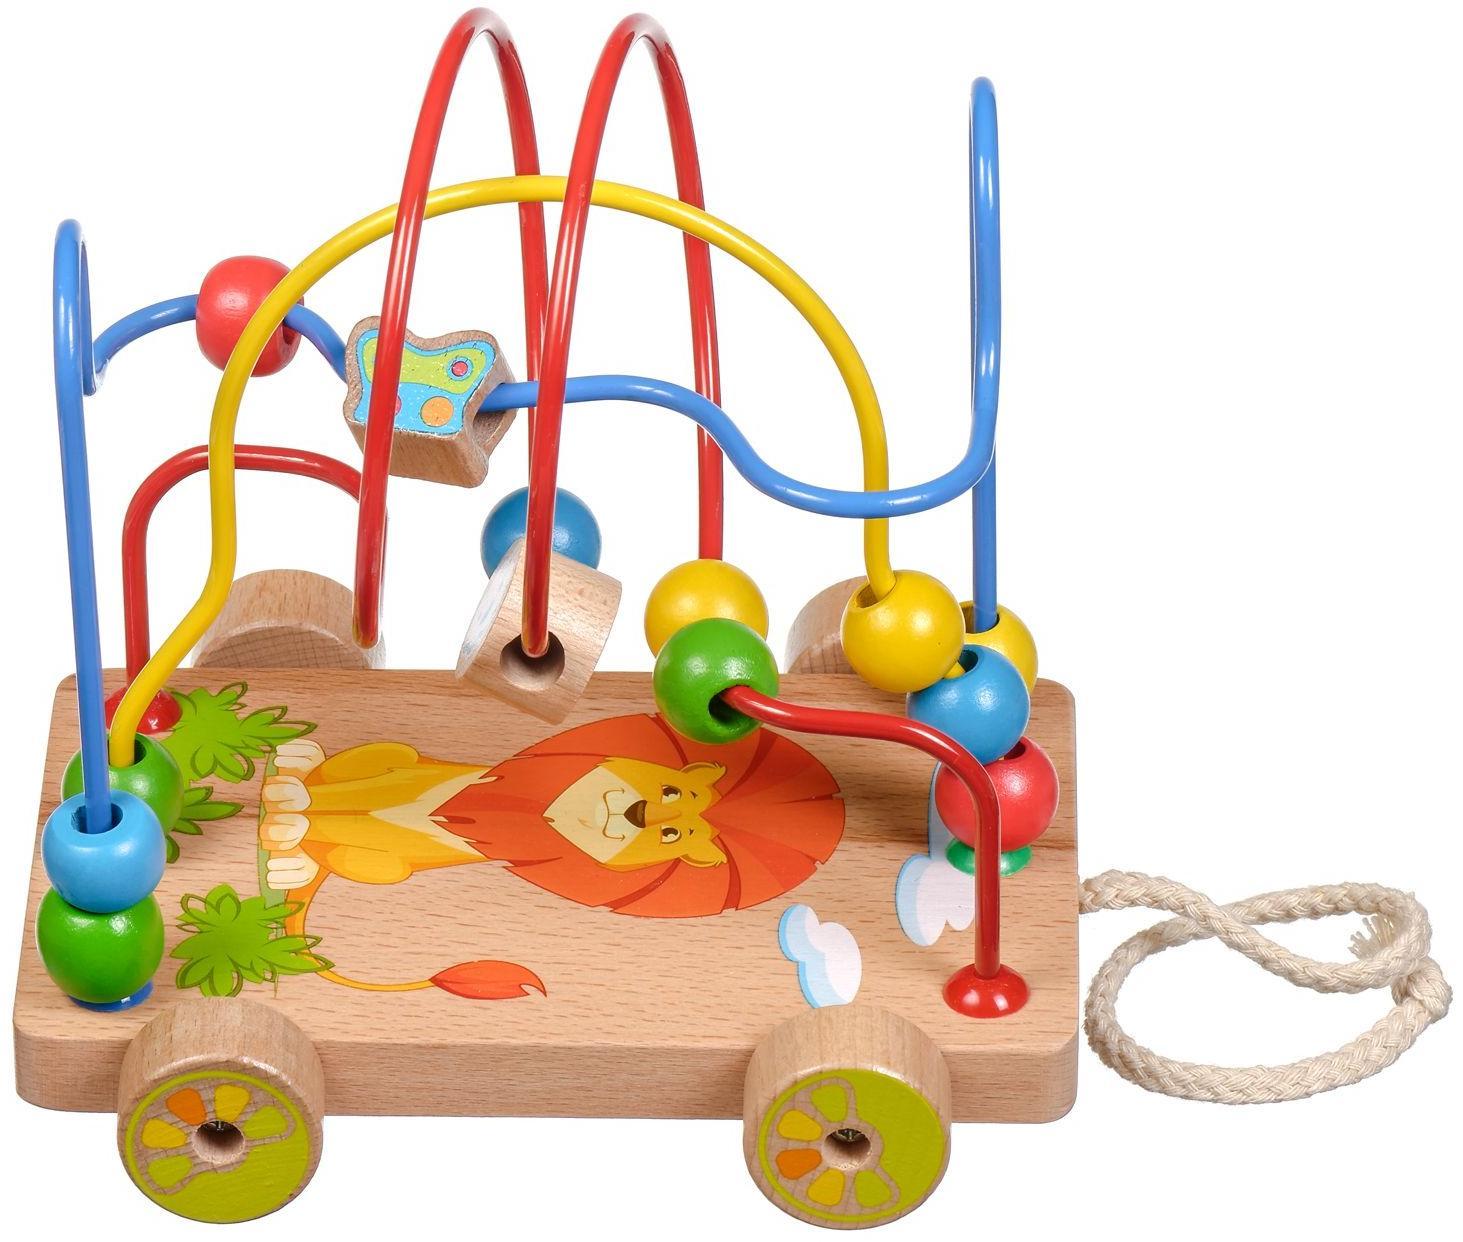 Развивающая игрушка МДИ Лабиринт-каталка Львенок Д011